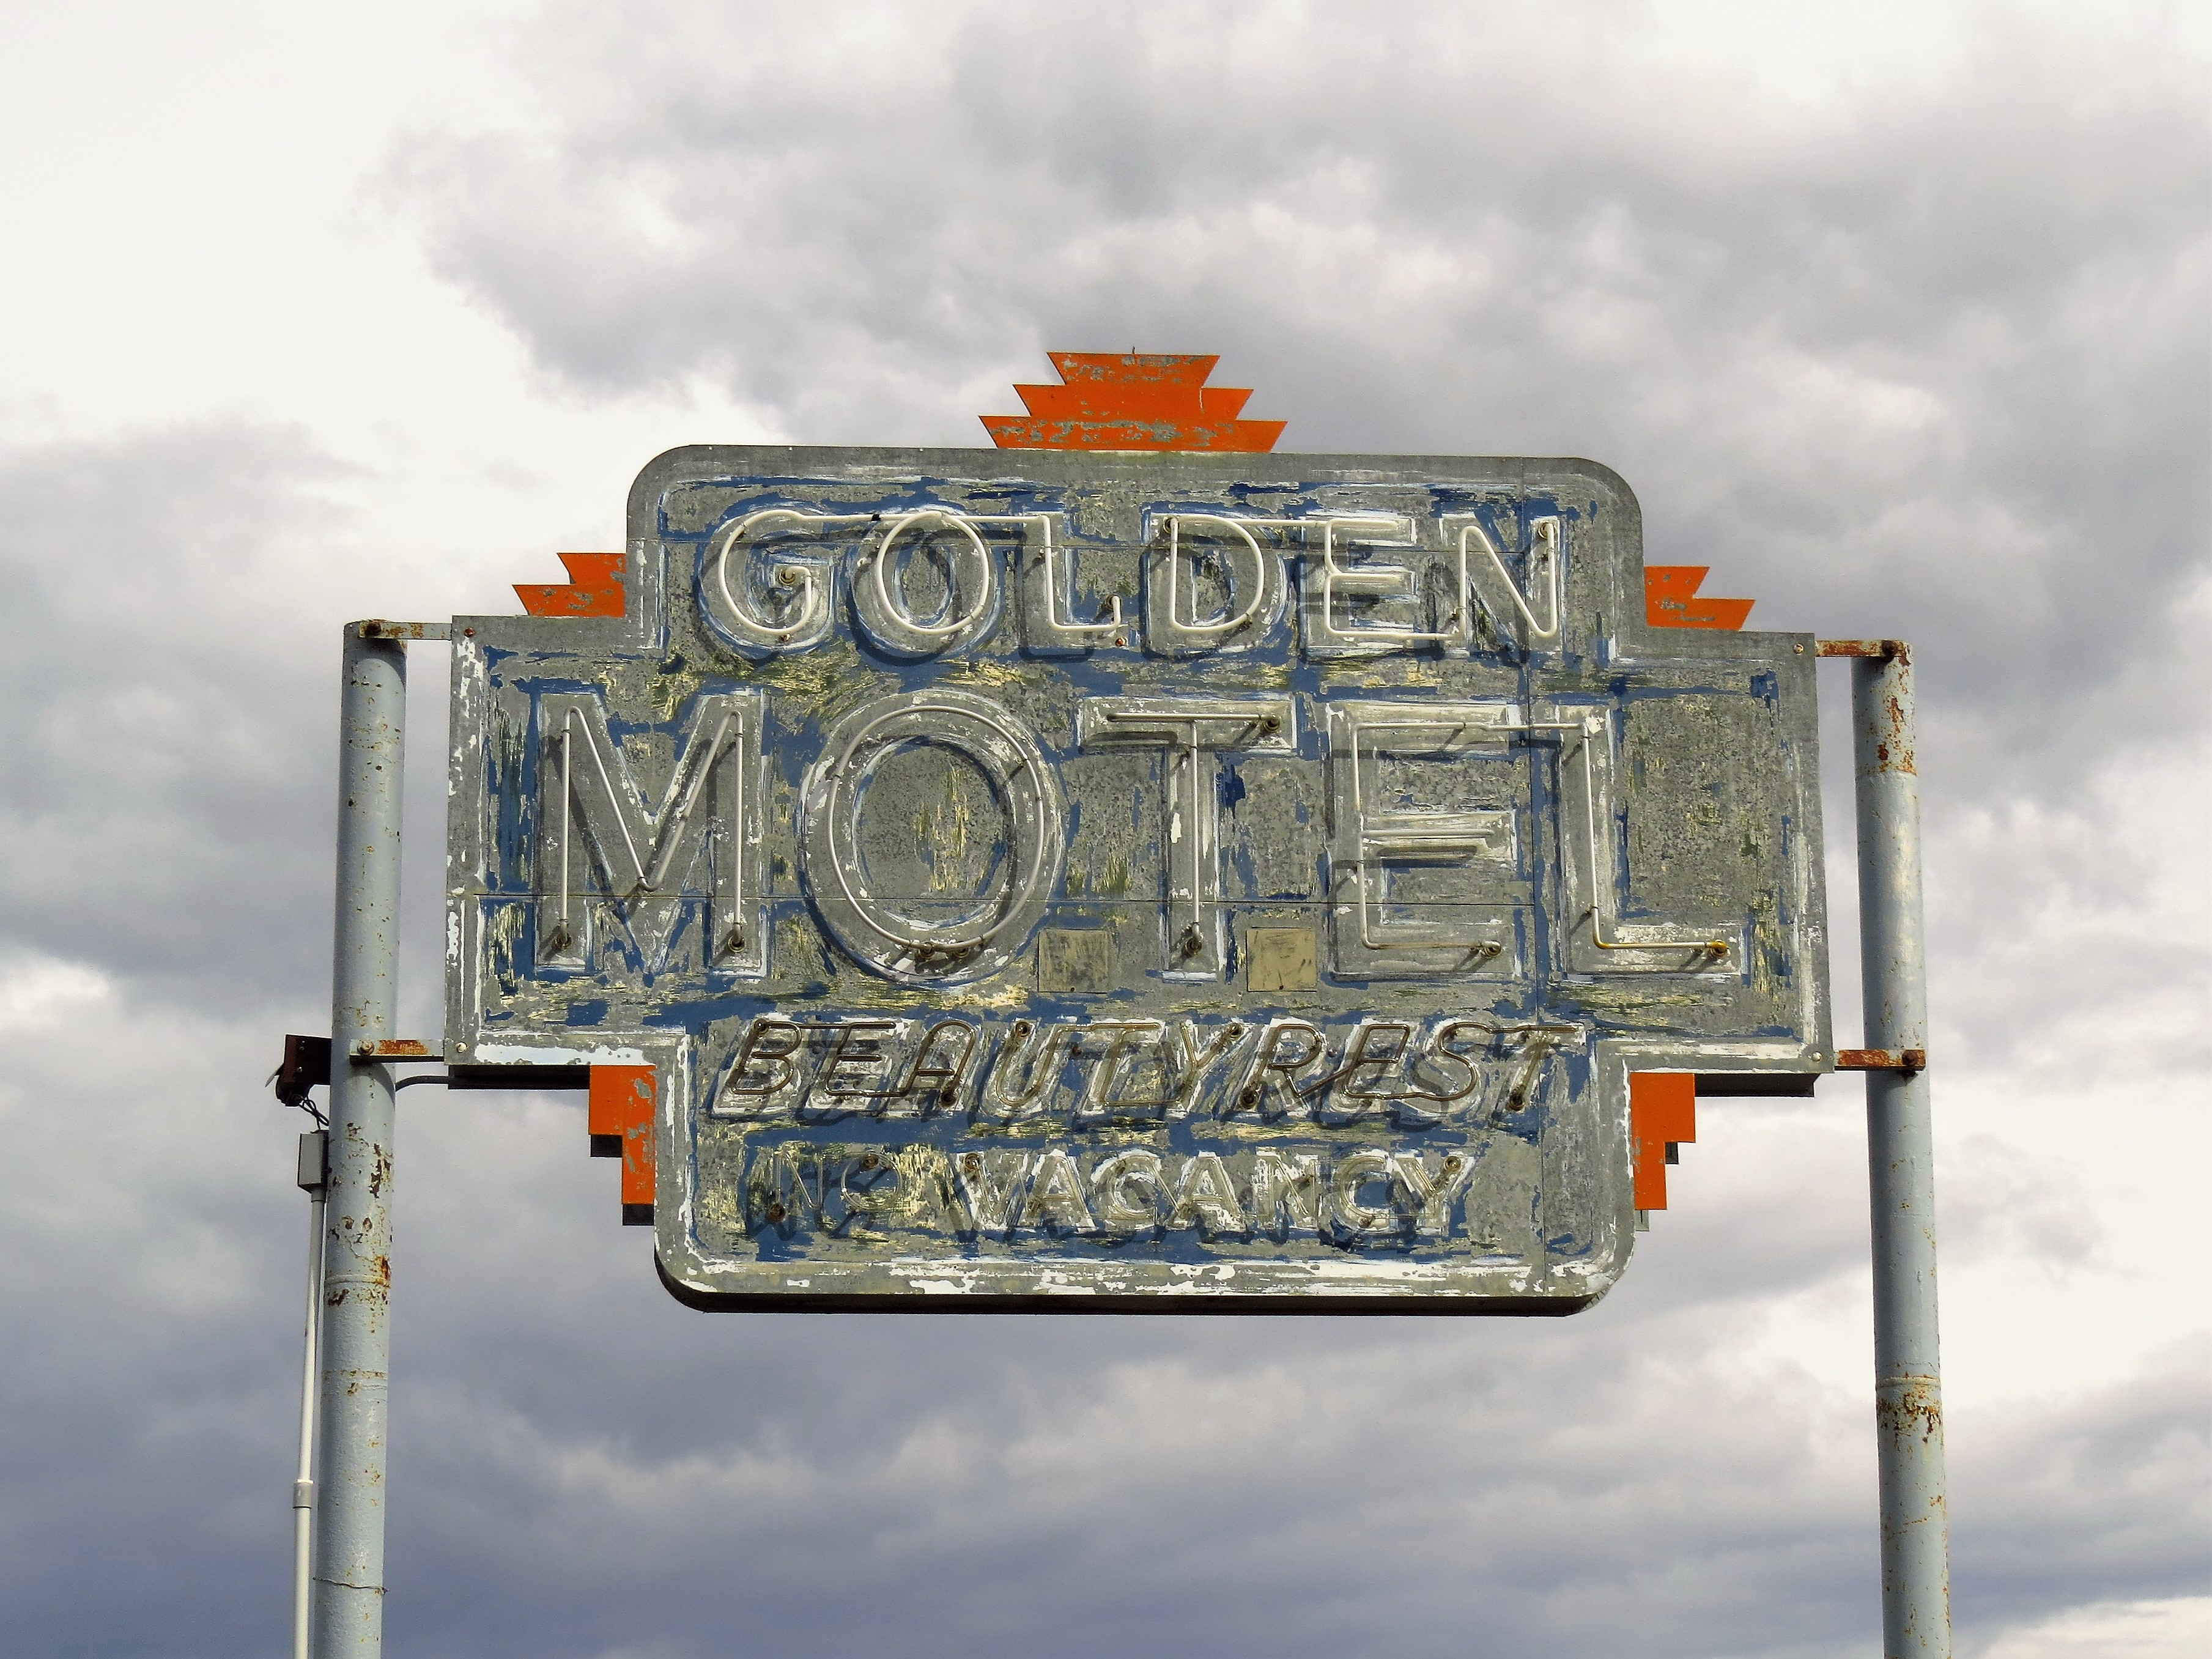 Golden Motel - Valmy, Nevada U.S.A. - May 24, 2019